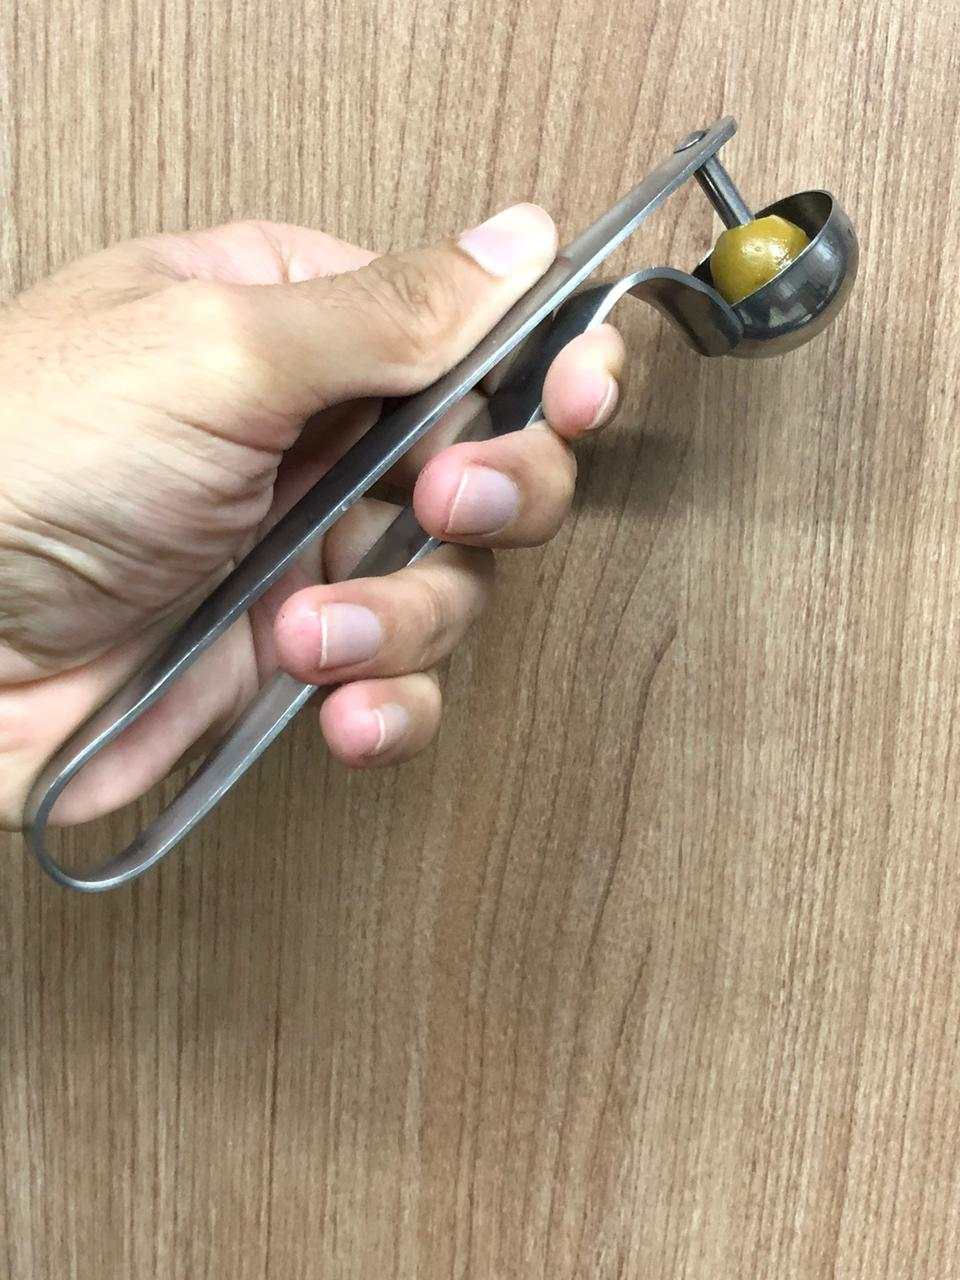 Descaroçador de azeitona aço inox 17cm utensilio MimoStyle